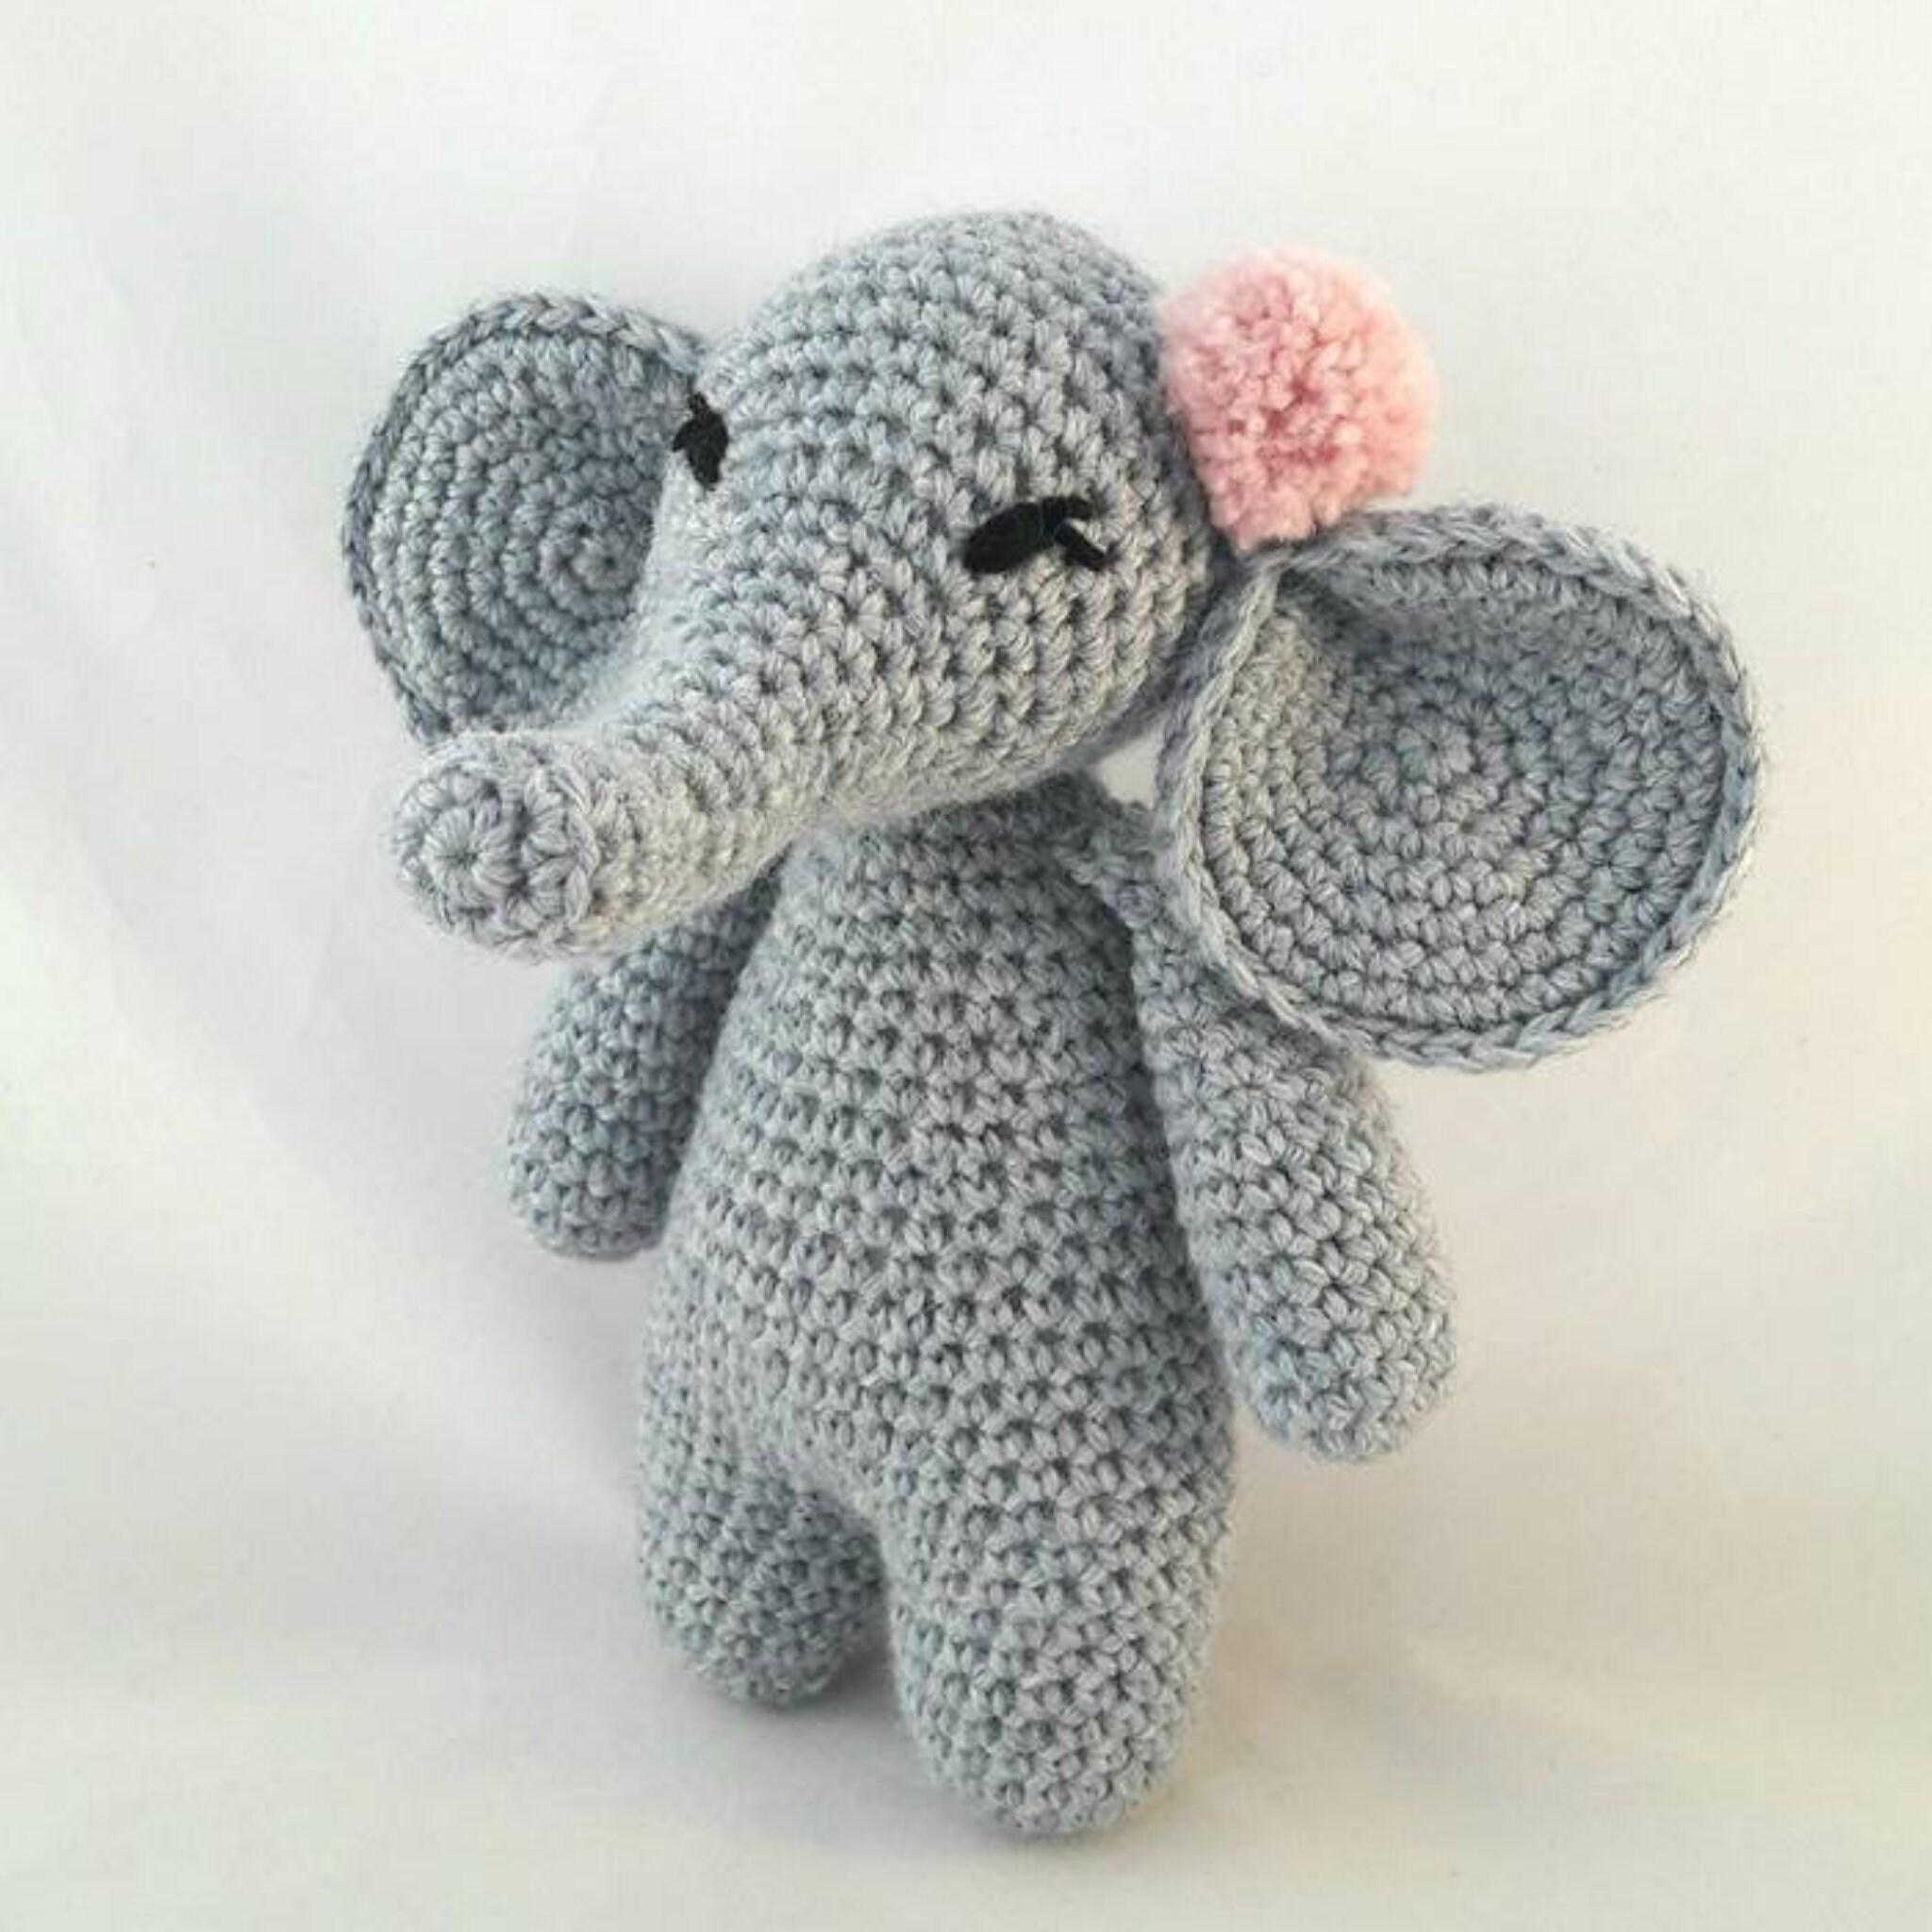 Amigurumi Cute Girl Elephant Free Crochet Pattern - Amigurumilove.pinto.live | 2048x2048